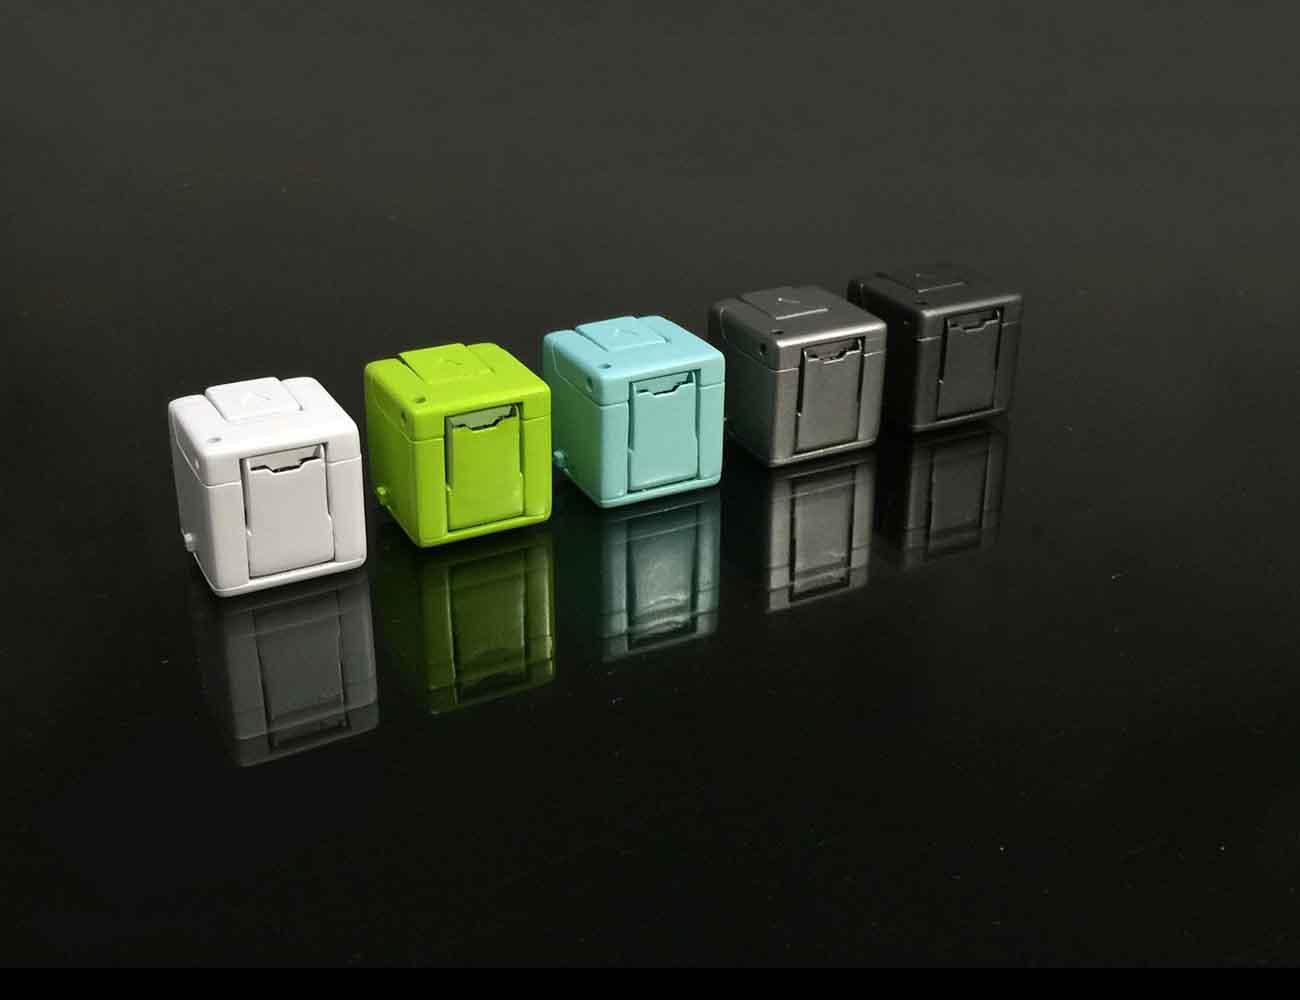 WonderCube: 8 mobile essentials in One Cubic Inch